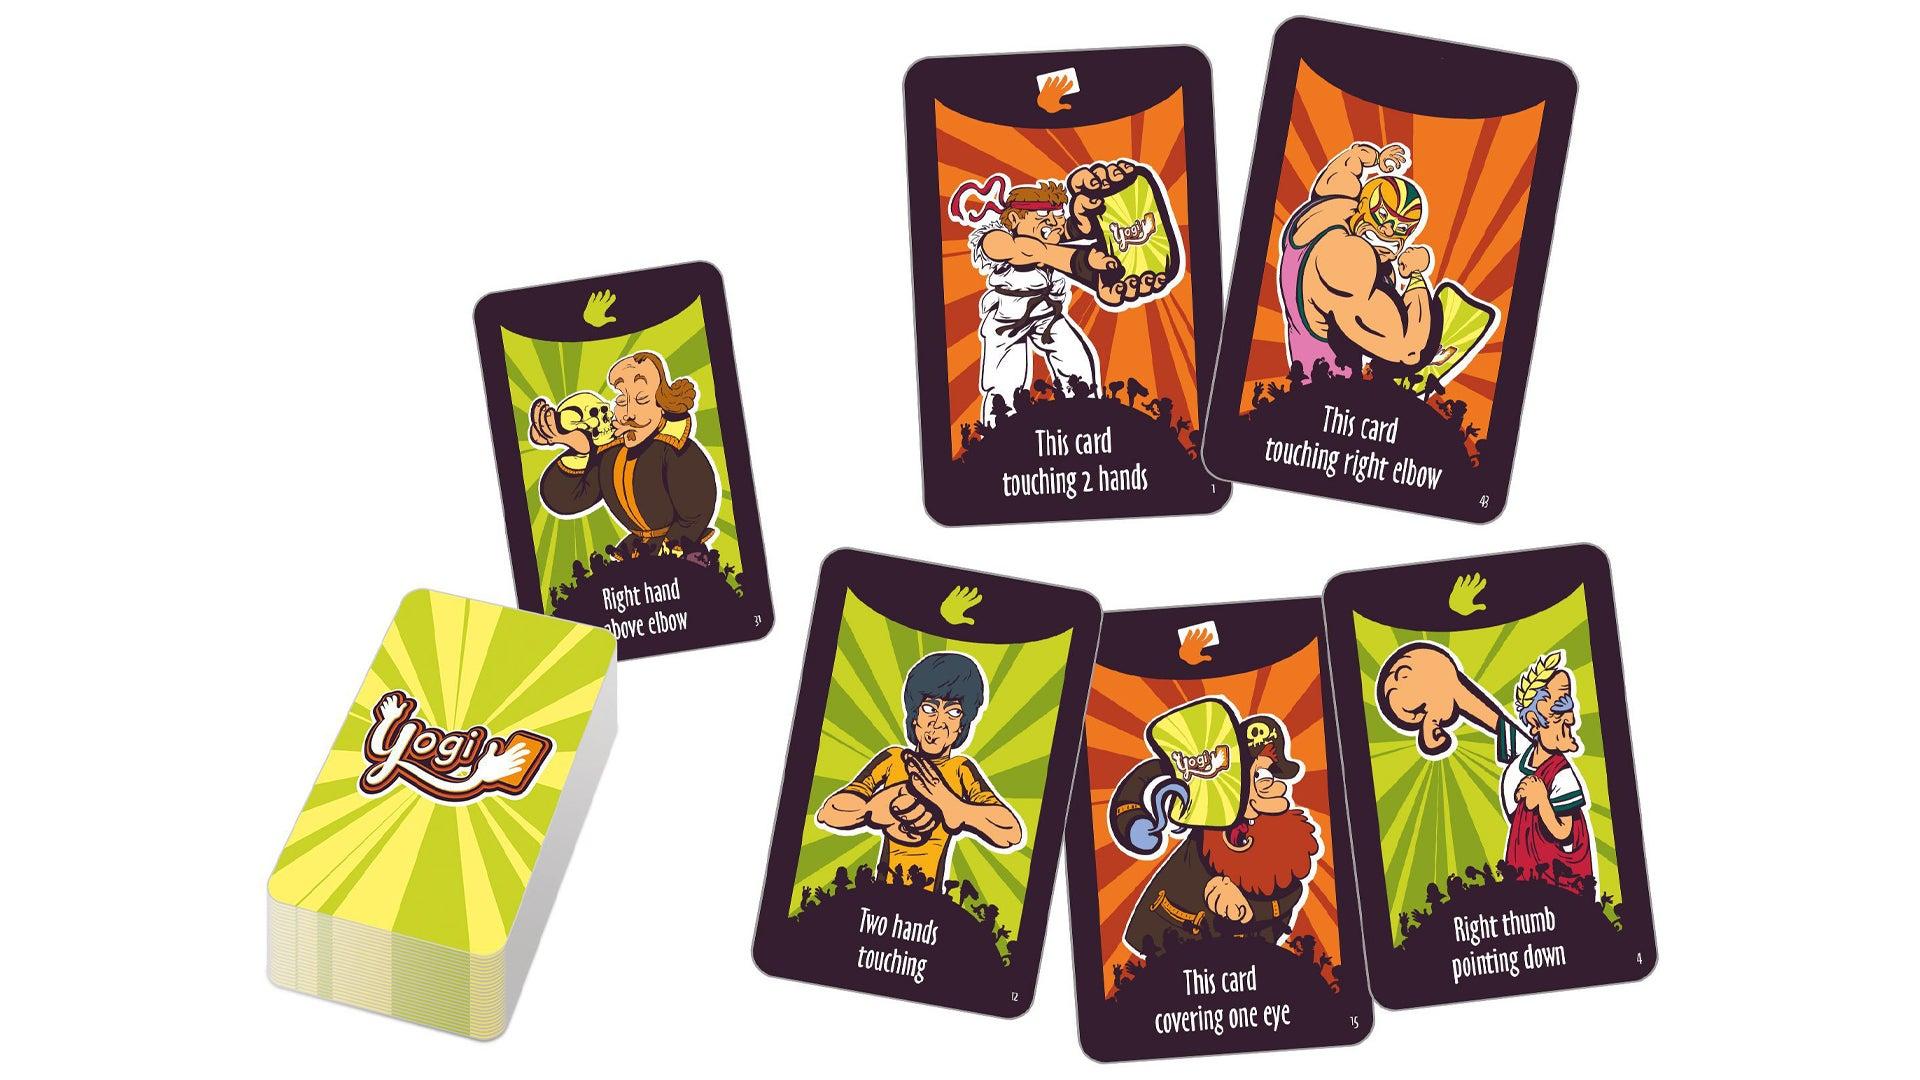 yogi-board-game-cards.jpg